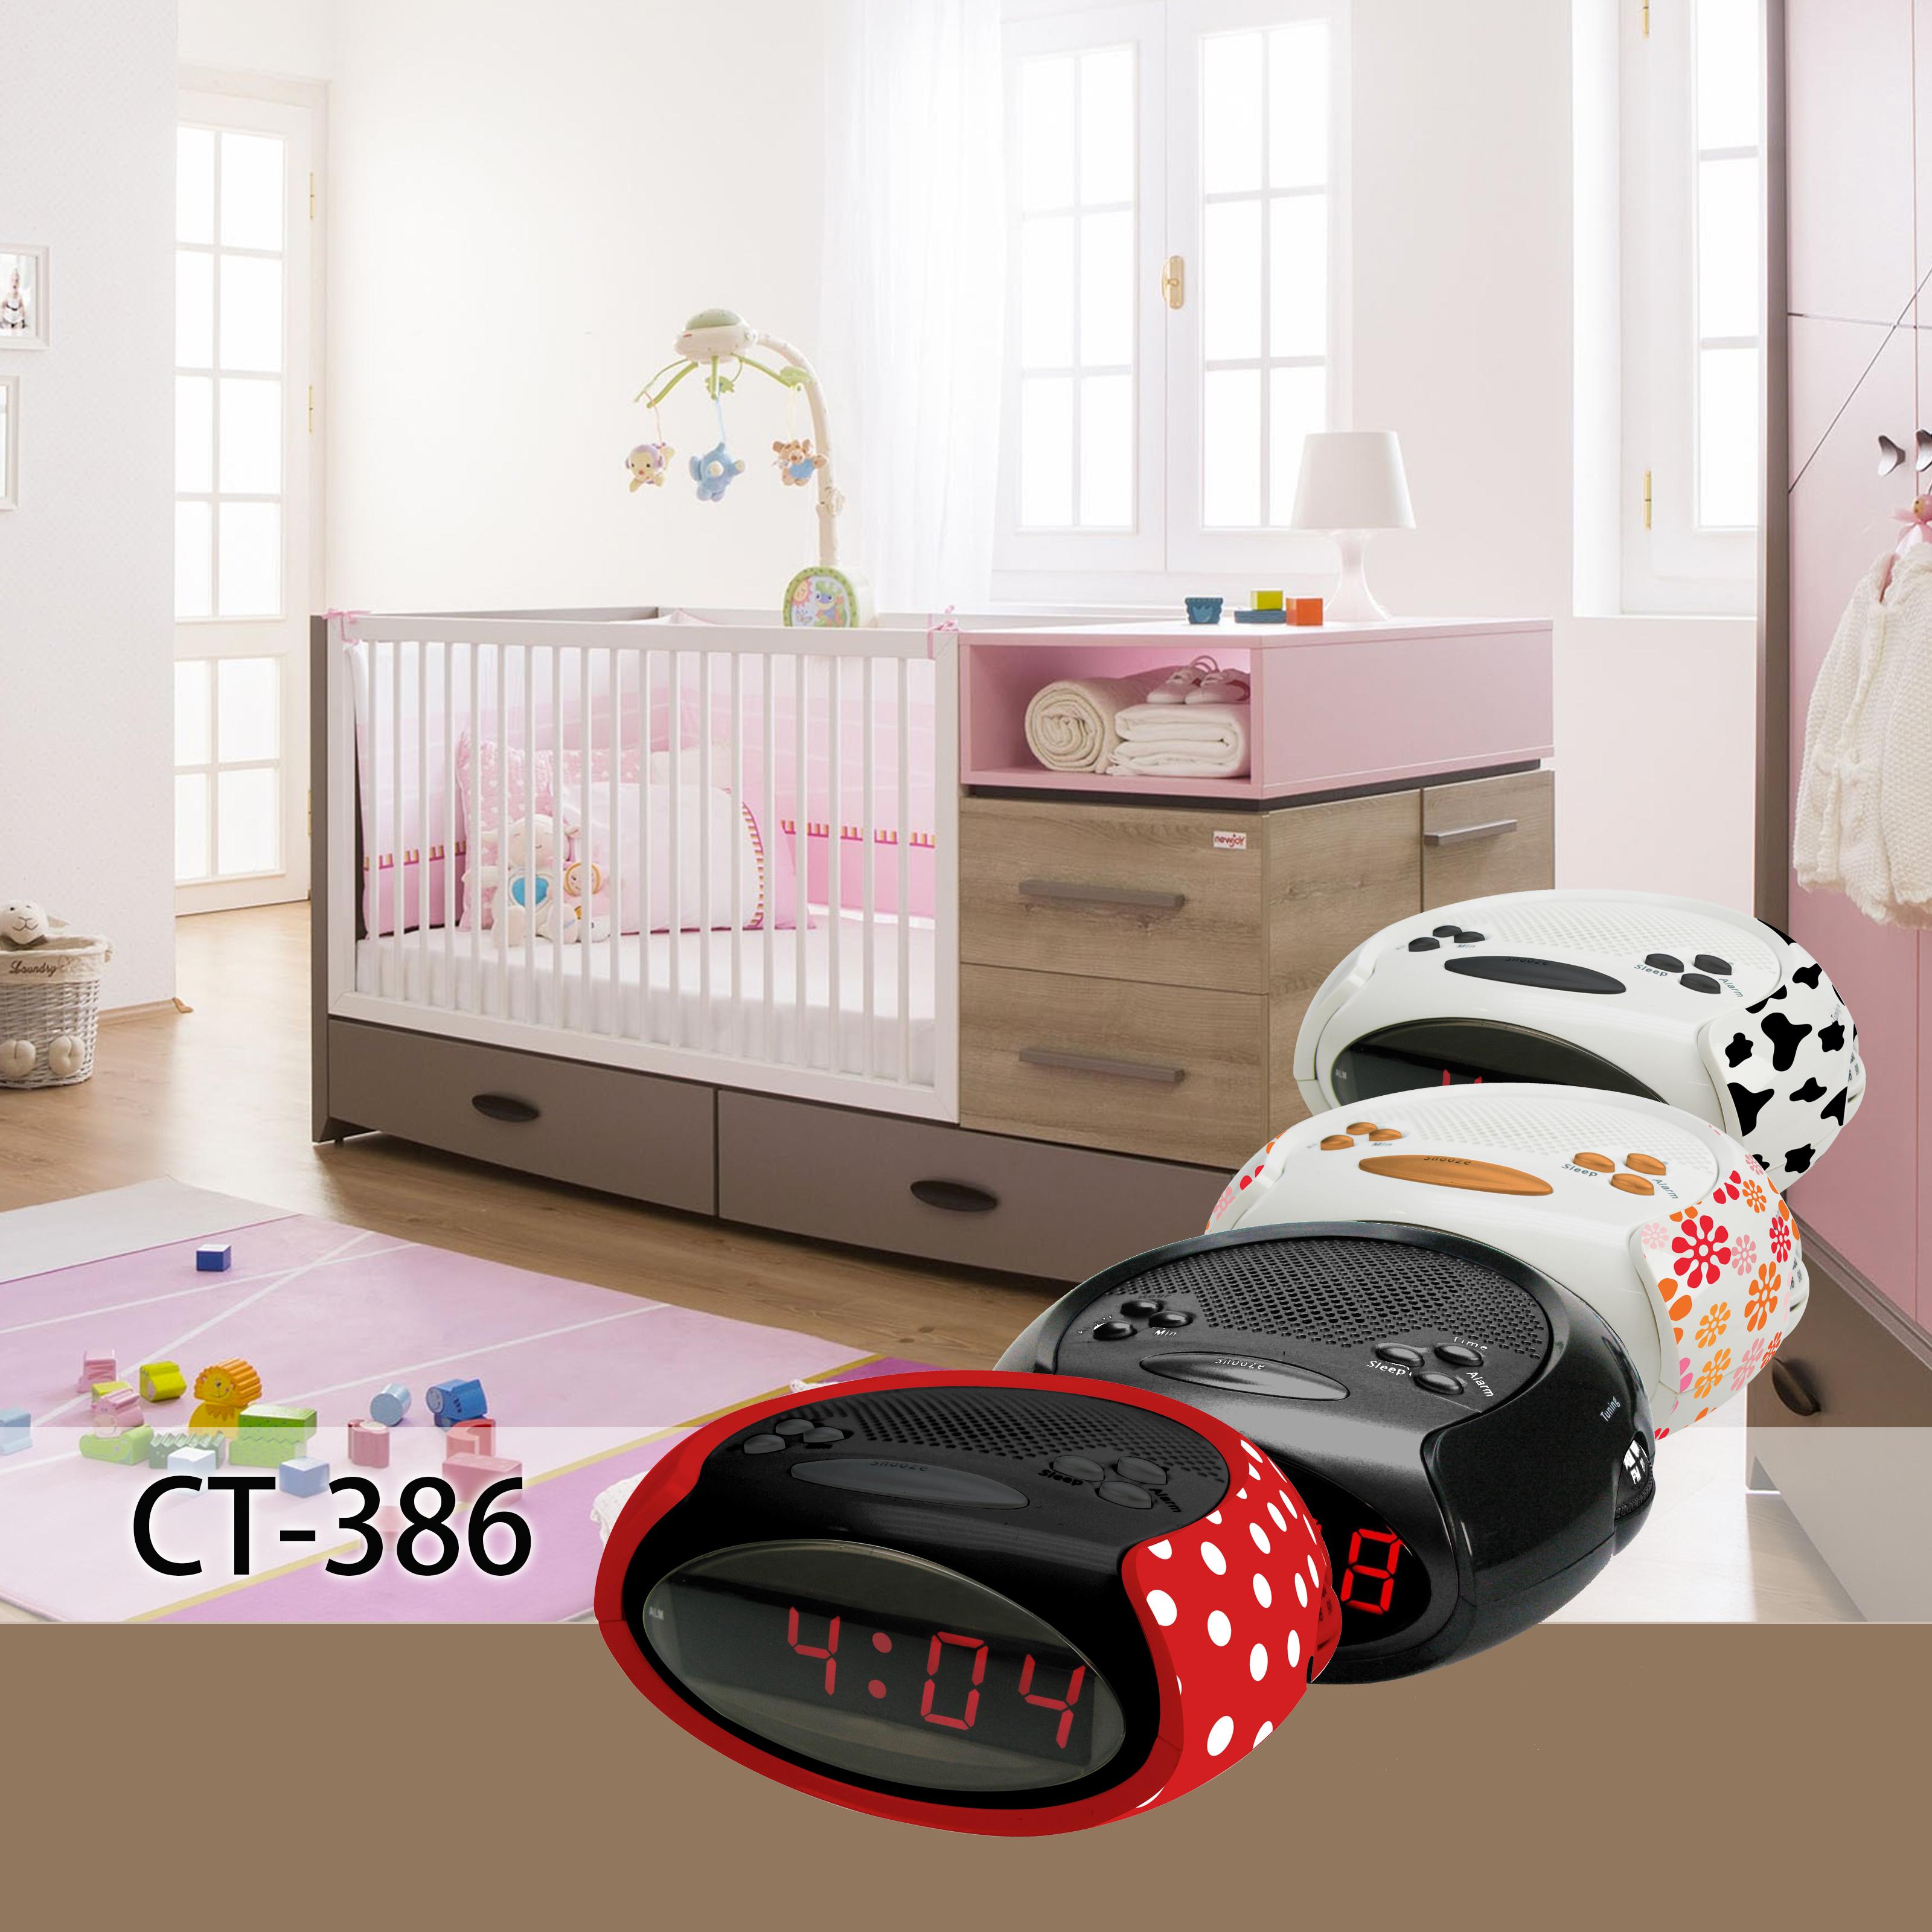 CT-386 baby room.jpg